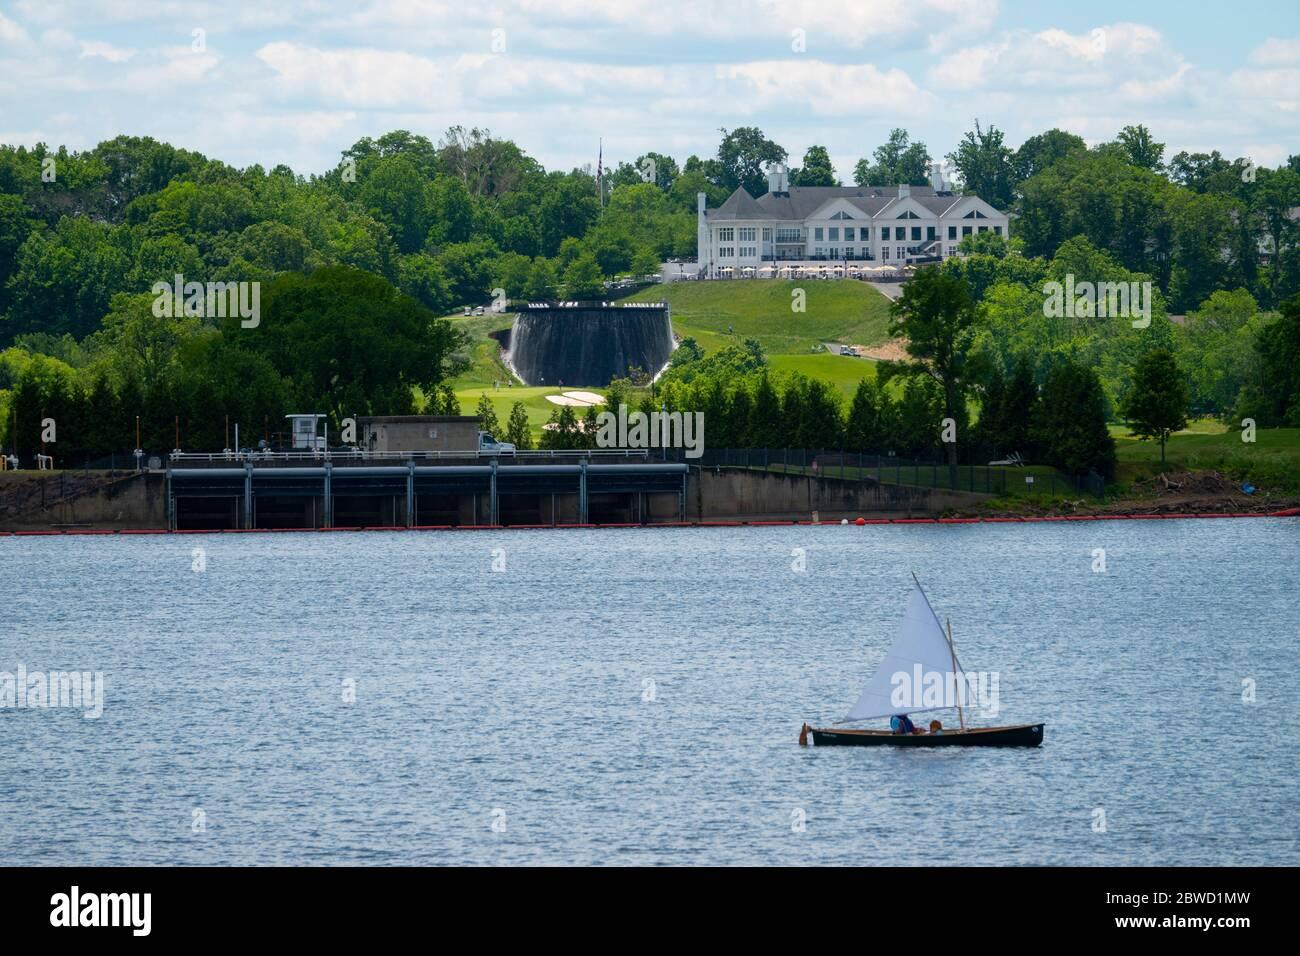 usa-virginia-trump-national-golf-club-on-the-potomac-river-in-sterling-virginia-club-house-sailboat-2BWD1MW.jpg